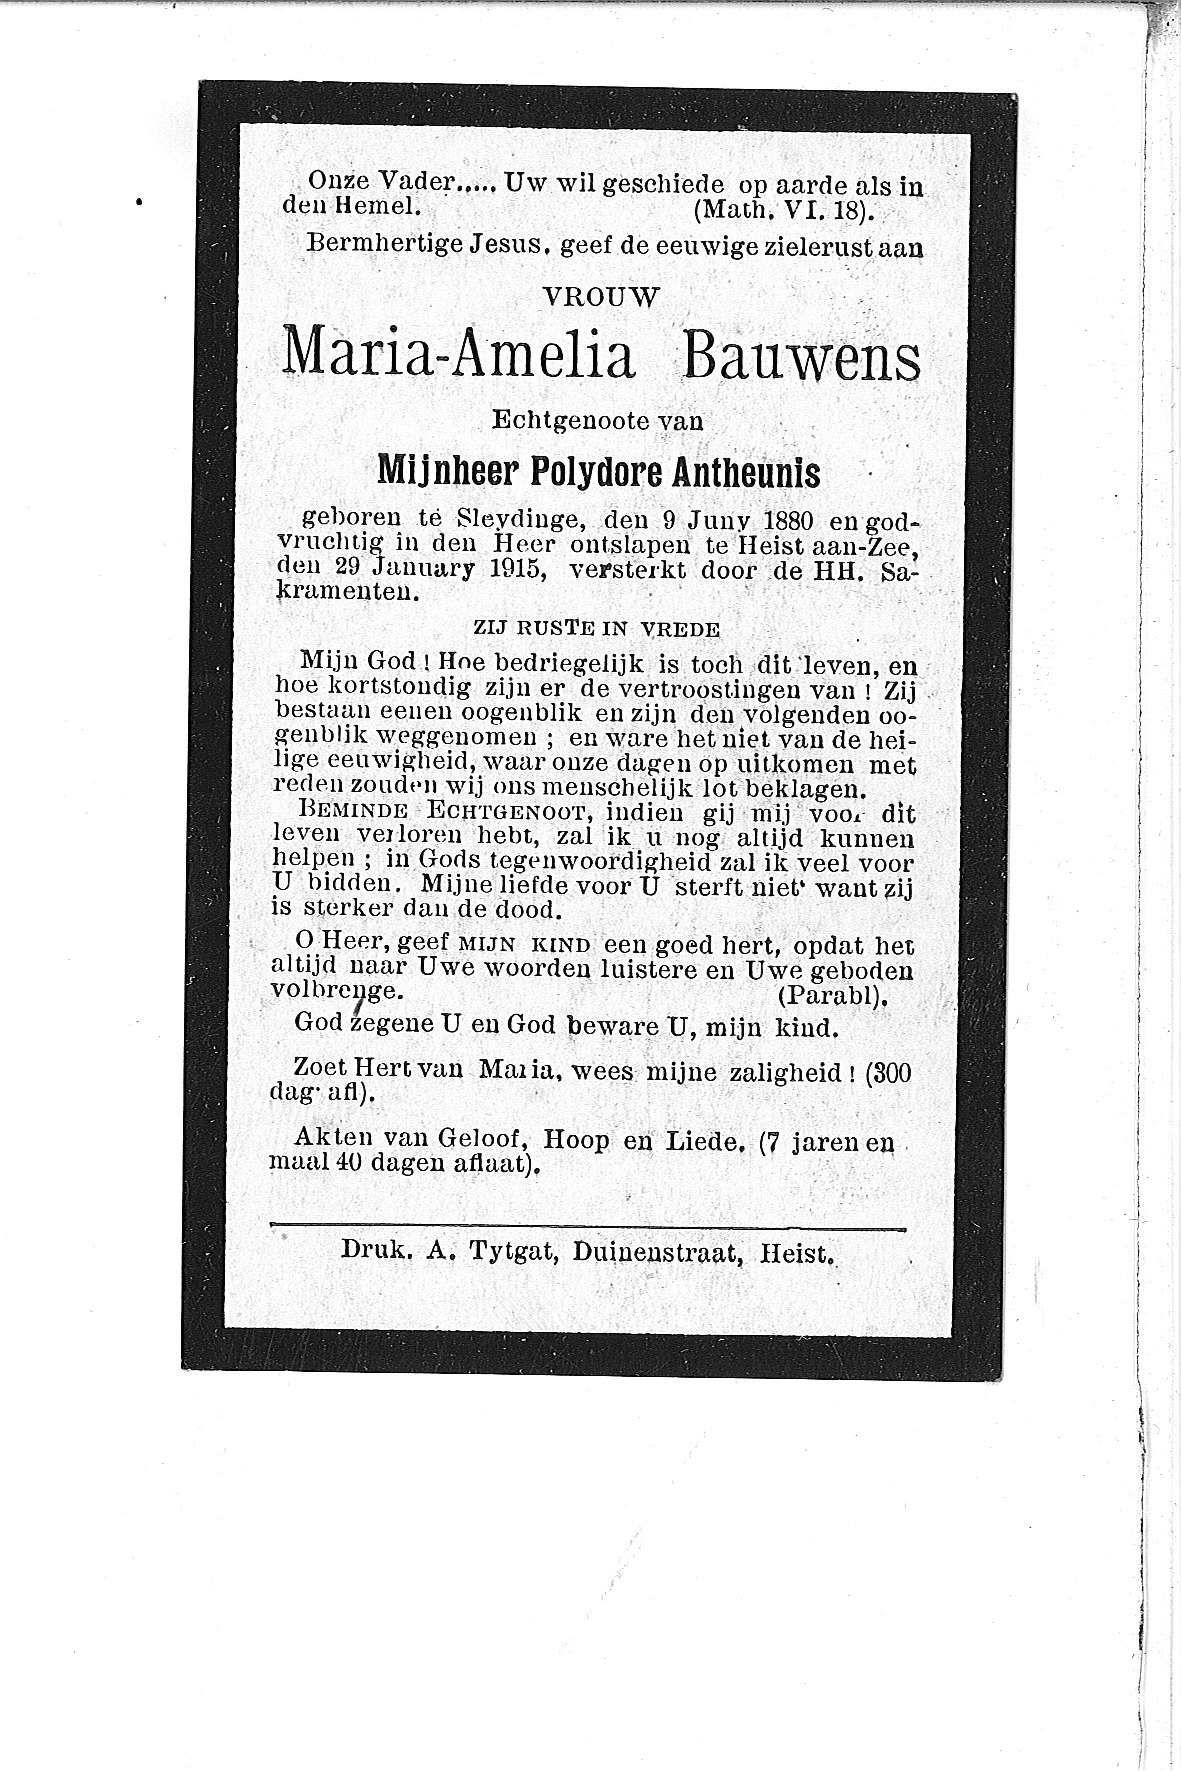 Maria-Amelia(1915)20101103090301_00017.jpg